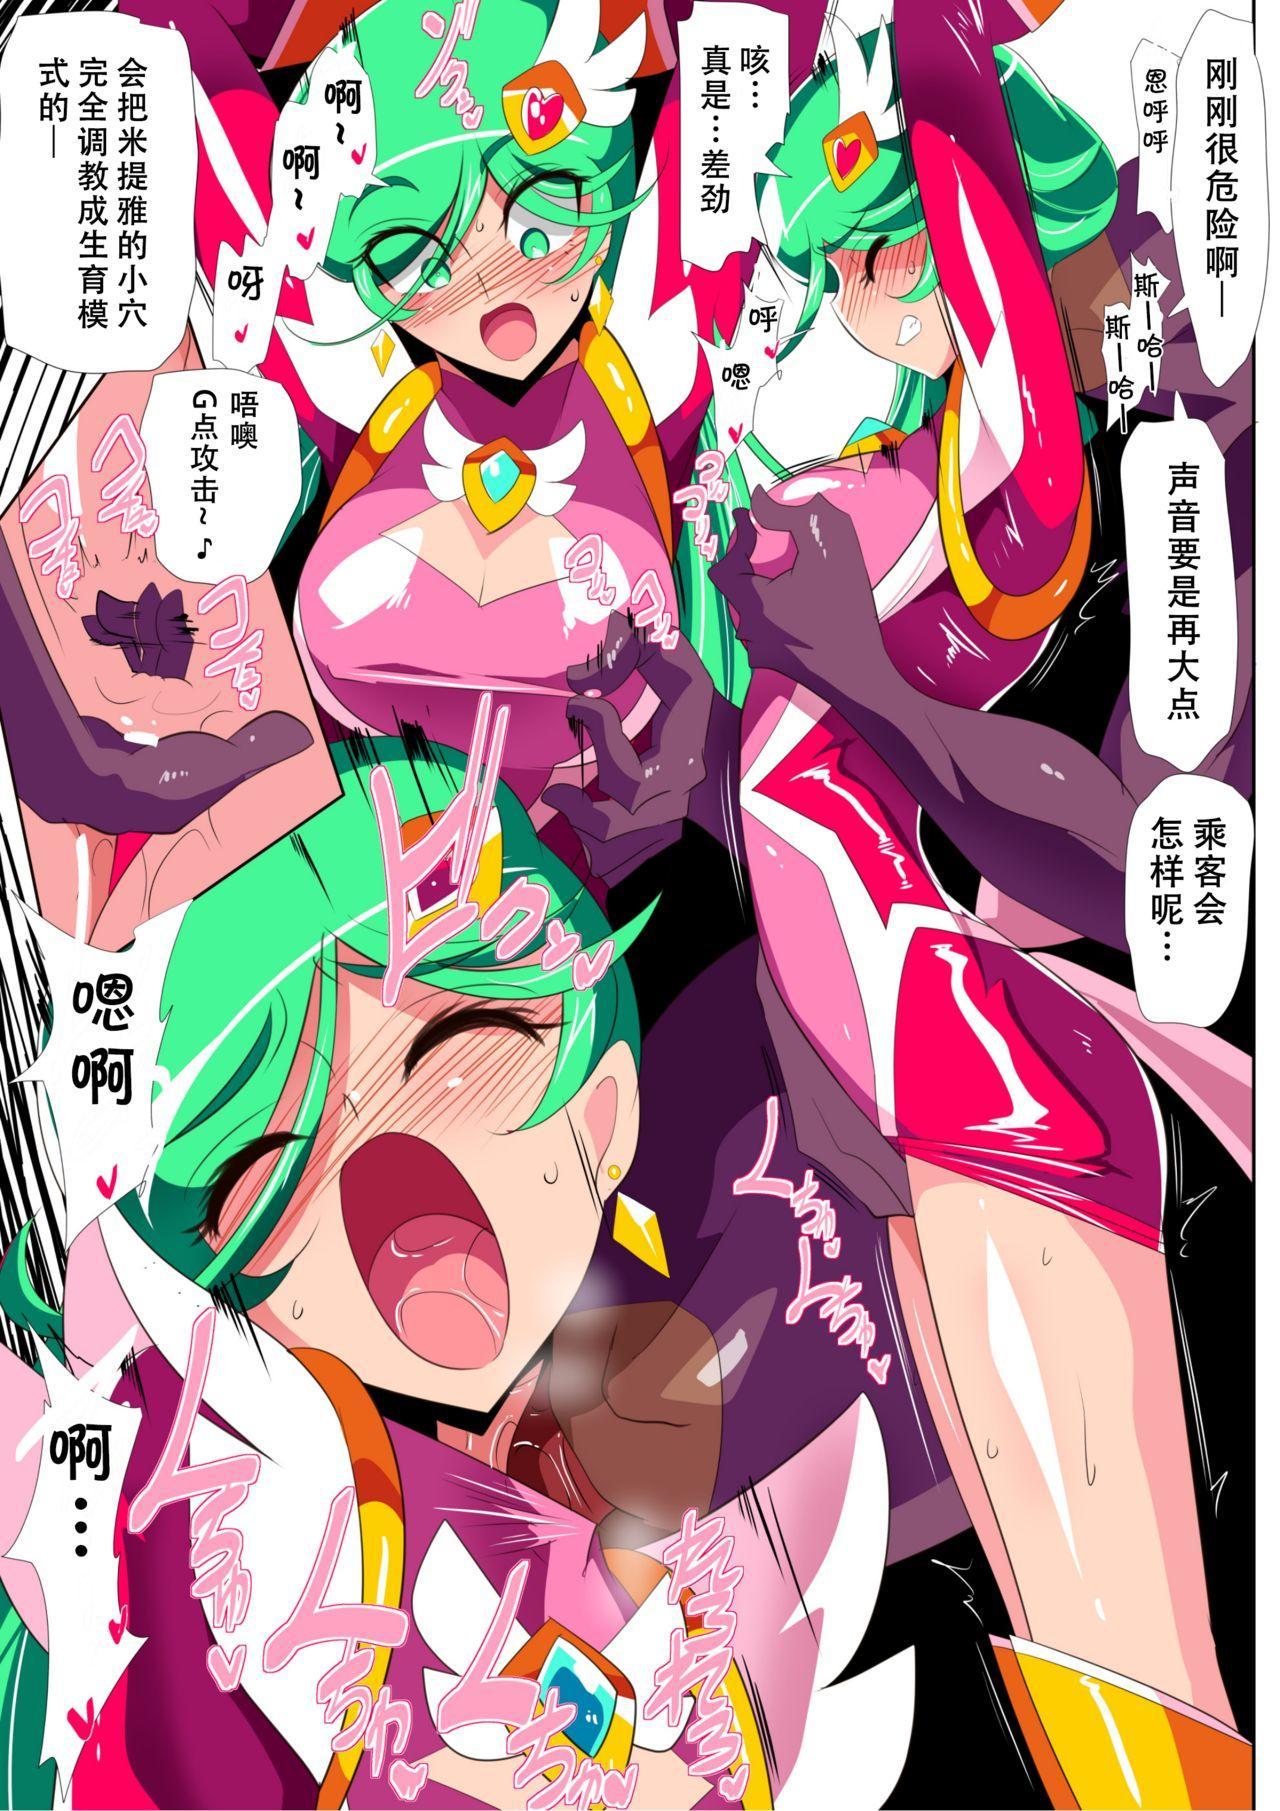 HEROINE LOSE 2 Psycho Lady Meteor Hen Psycho Power Heroine VS Kyousei Chikan Choukyou! 13